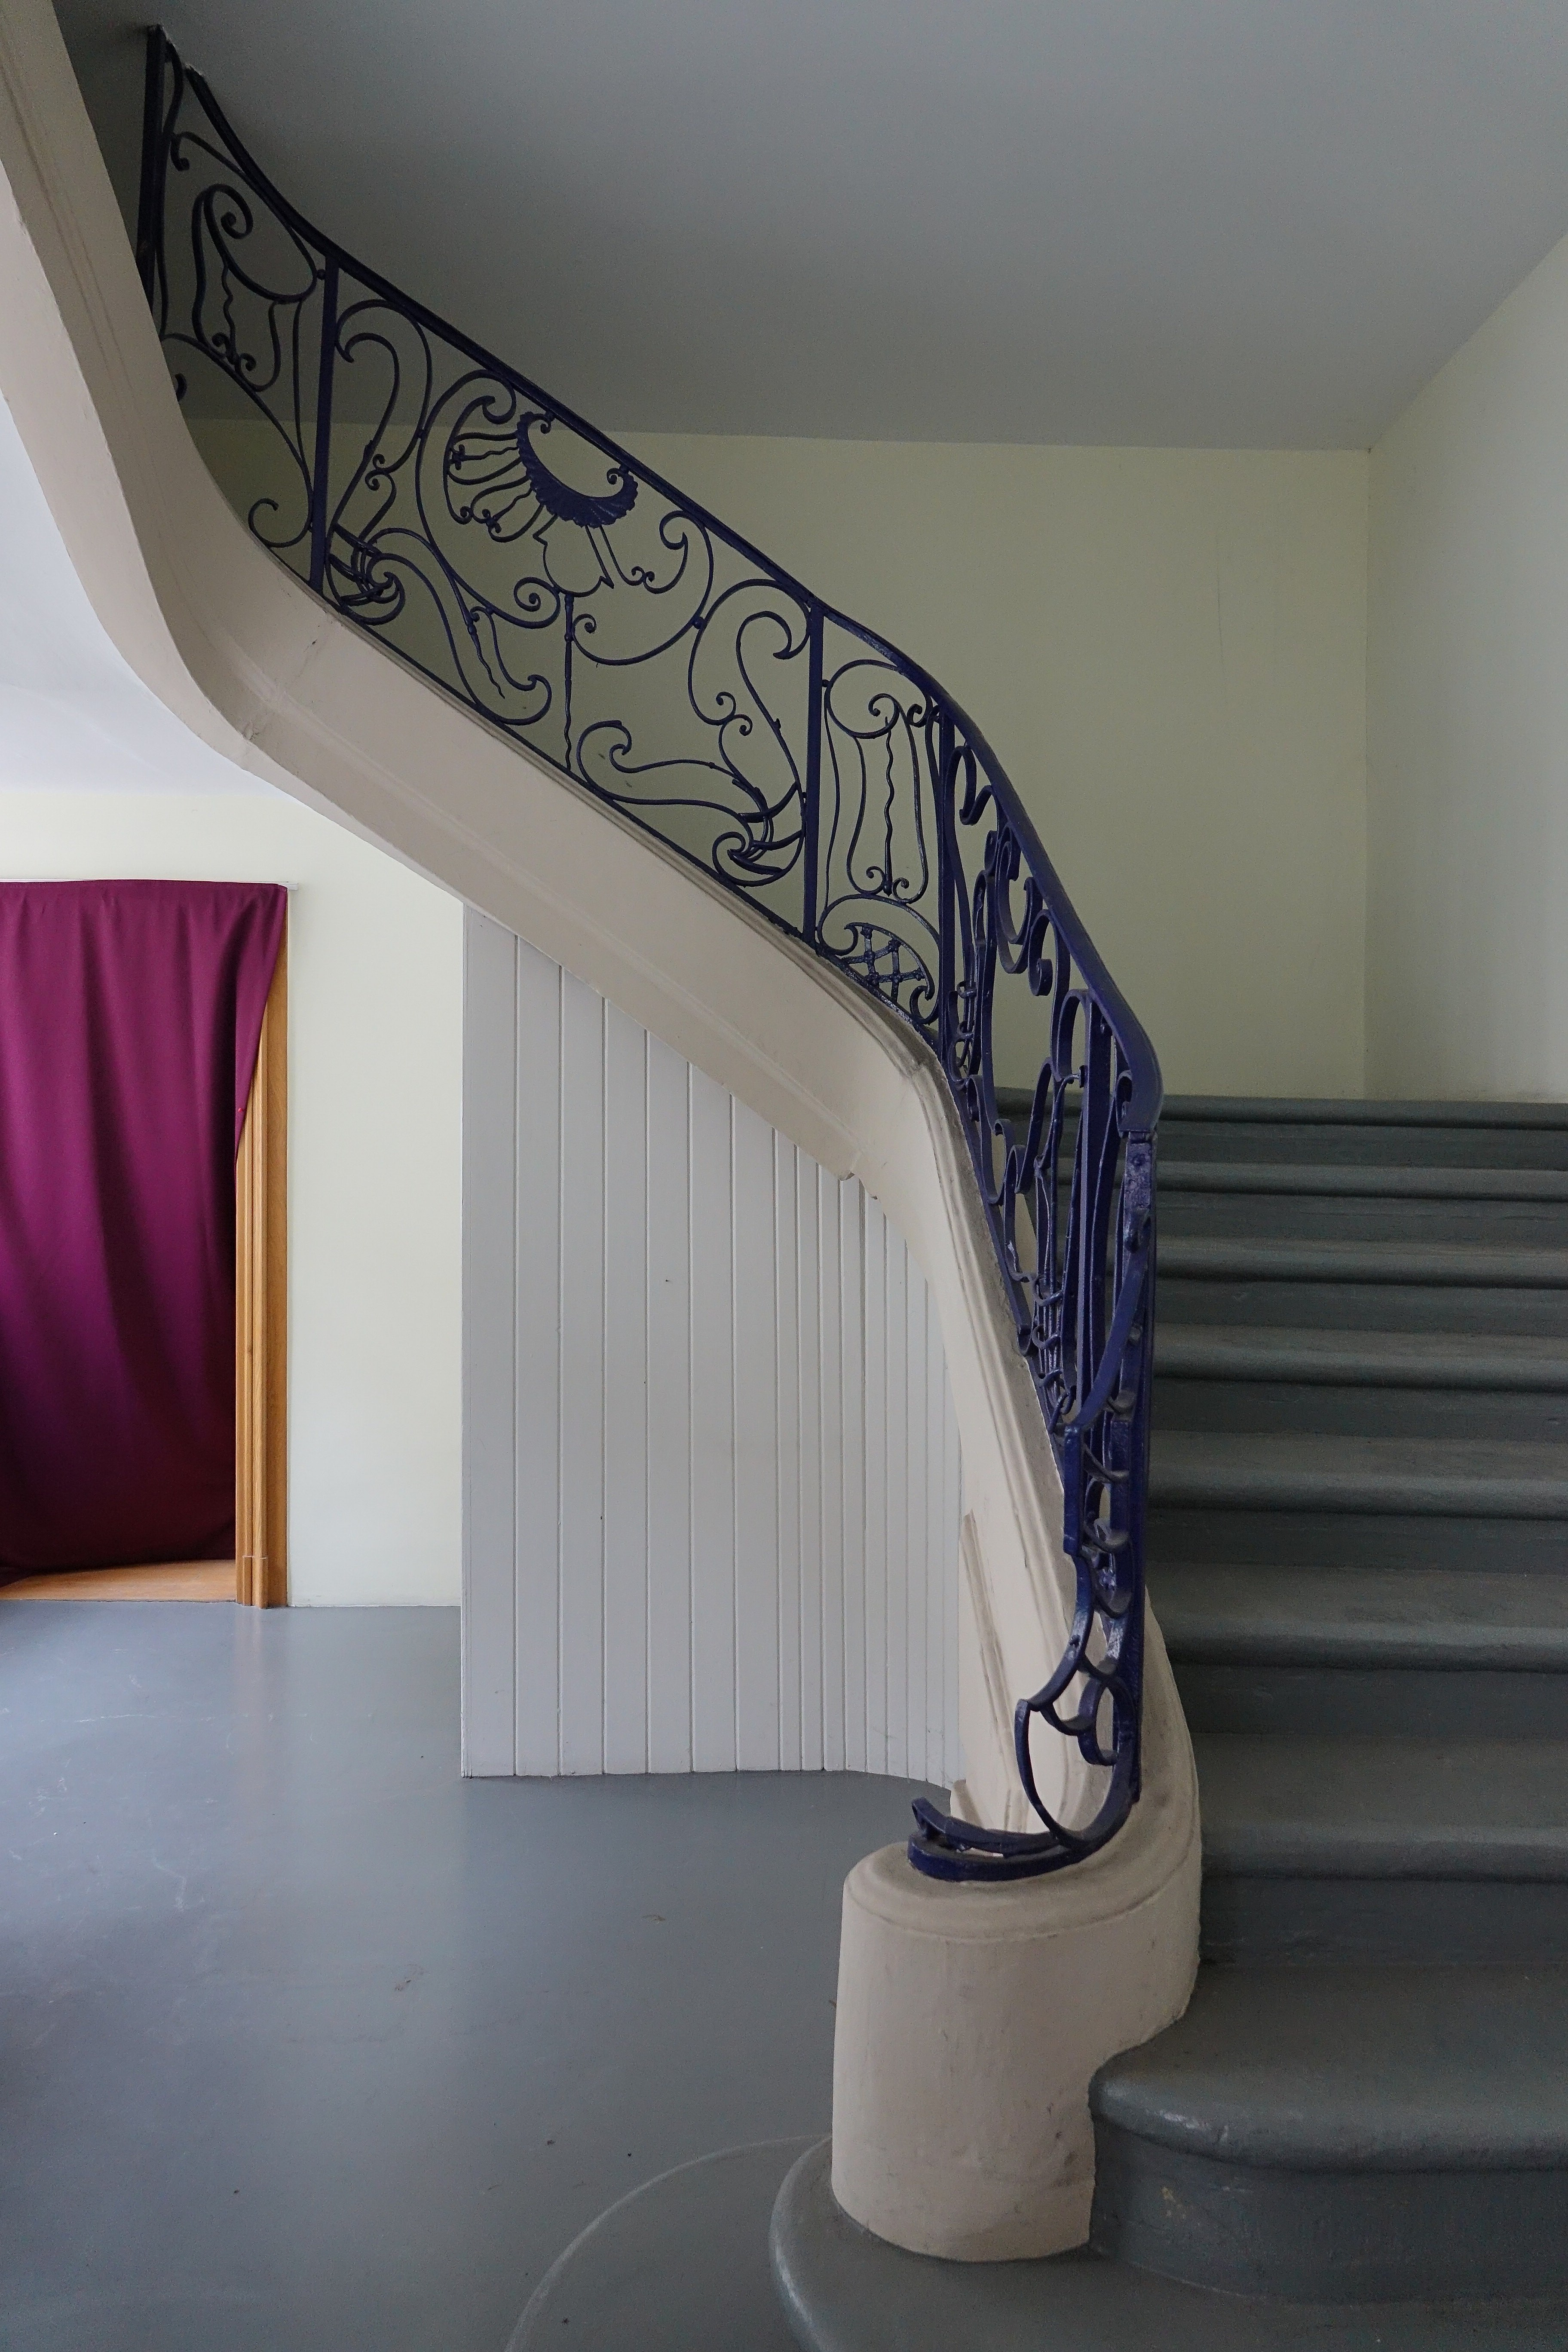 Garde De Corps Escalier file:hôtel de neuwiller - aile centrale - escalier à garde